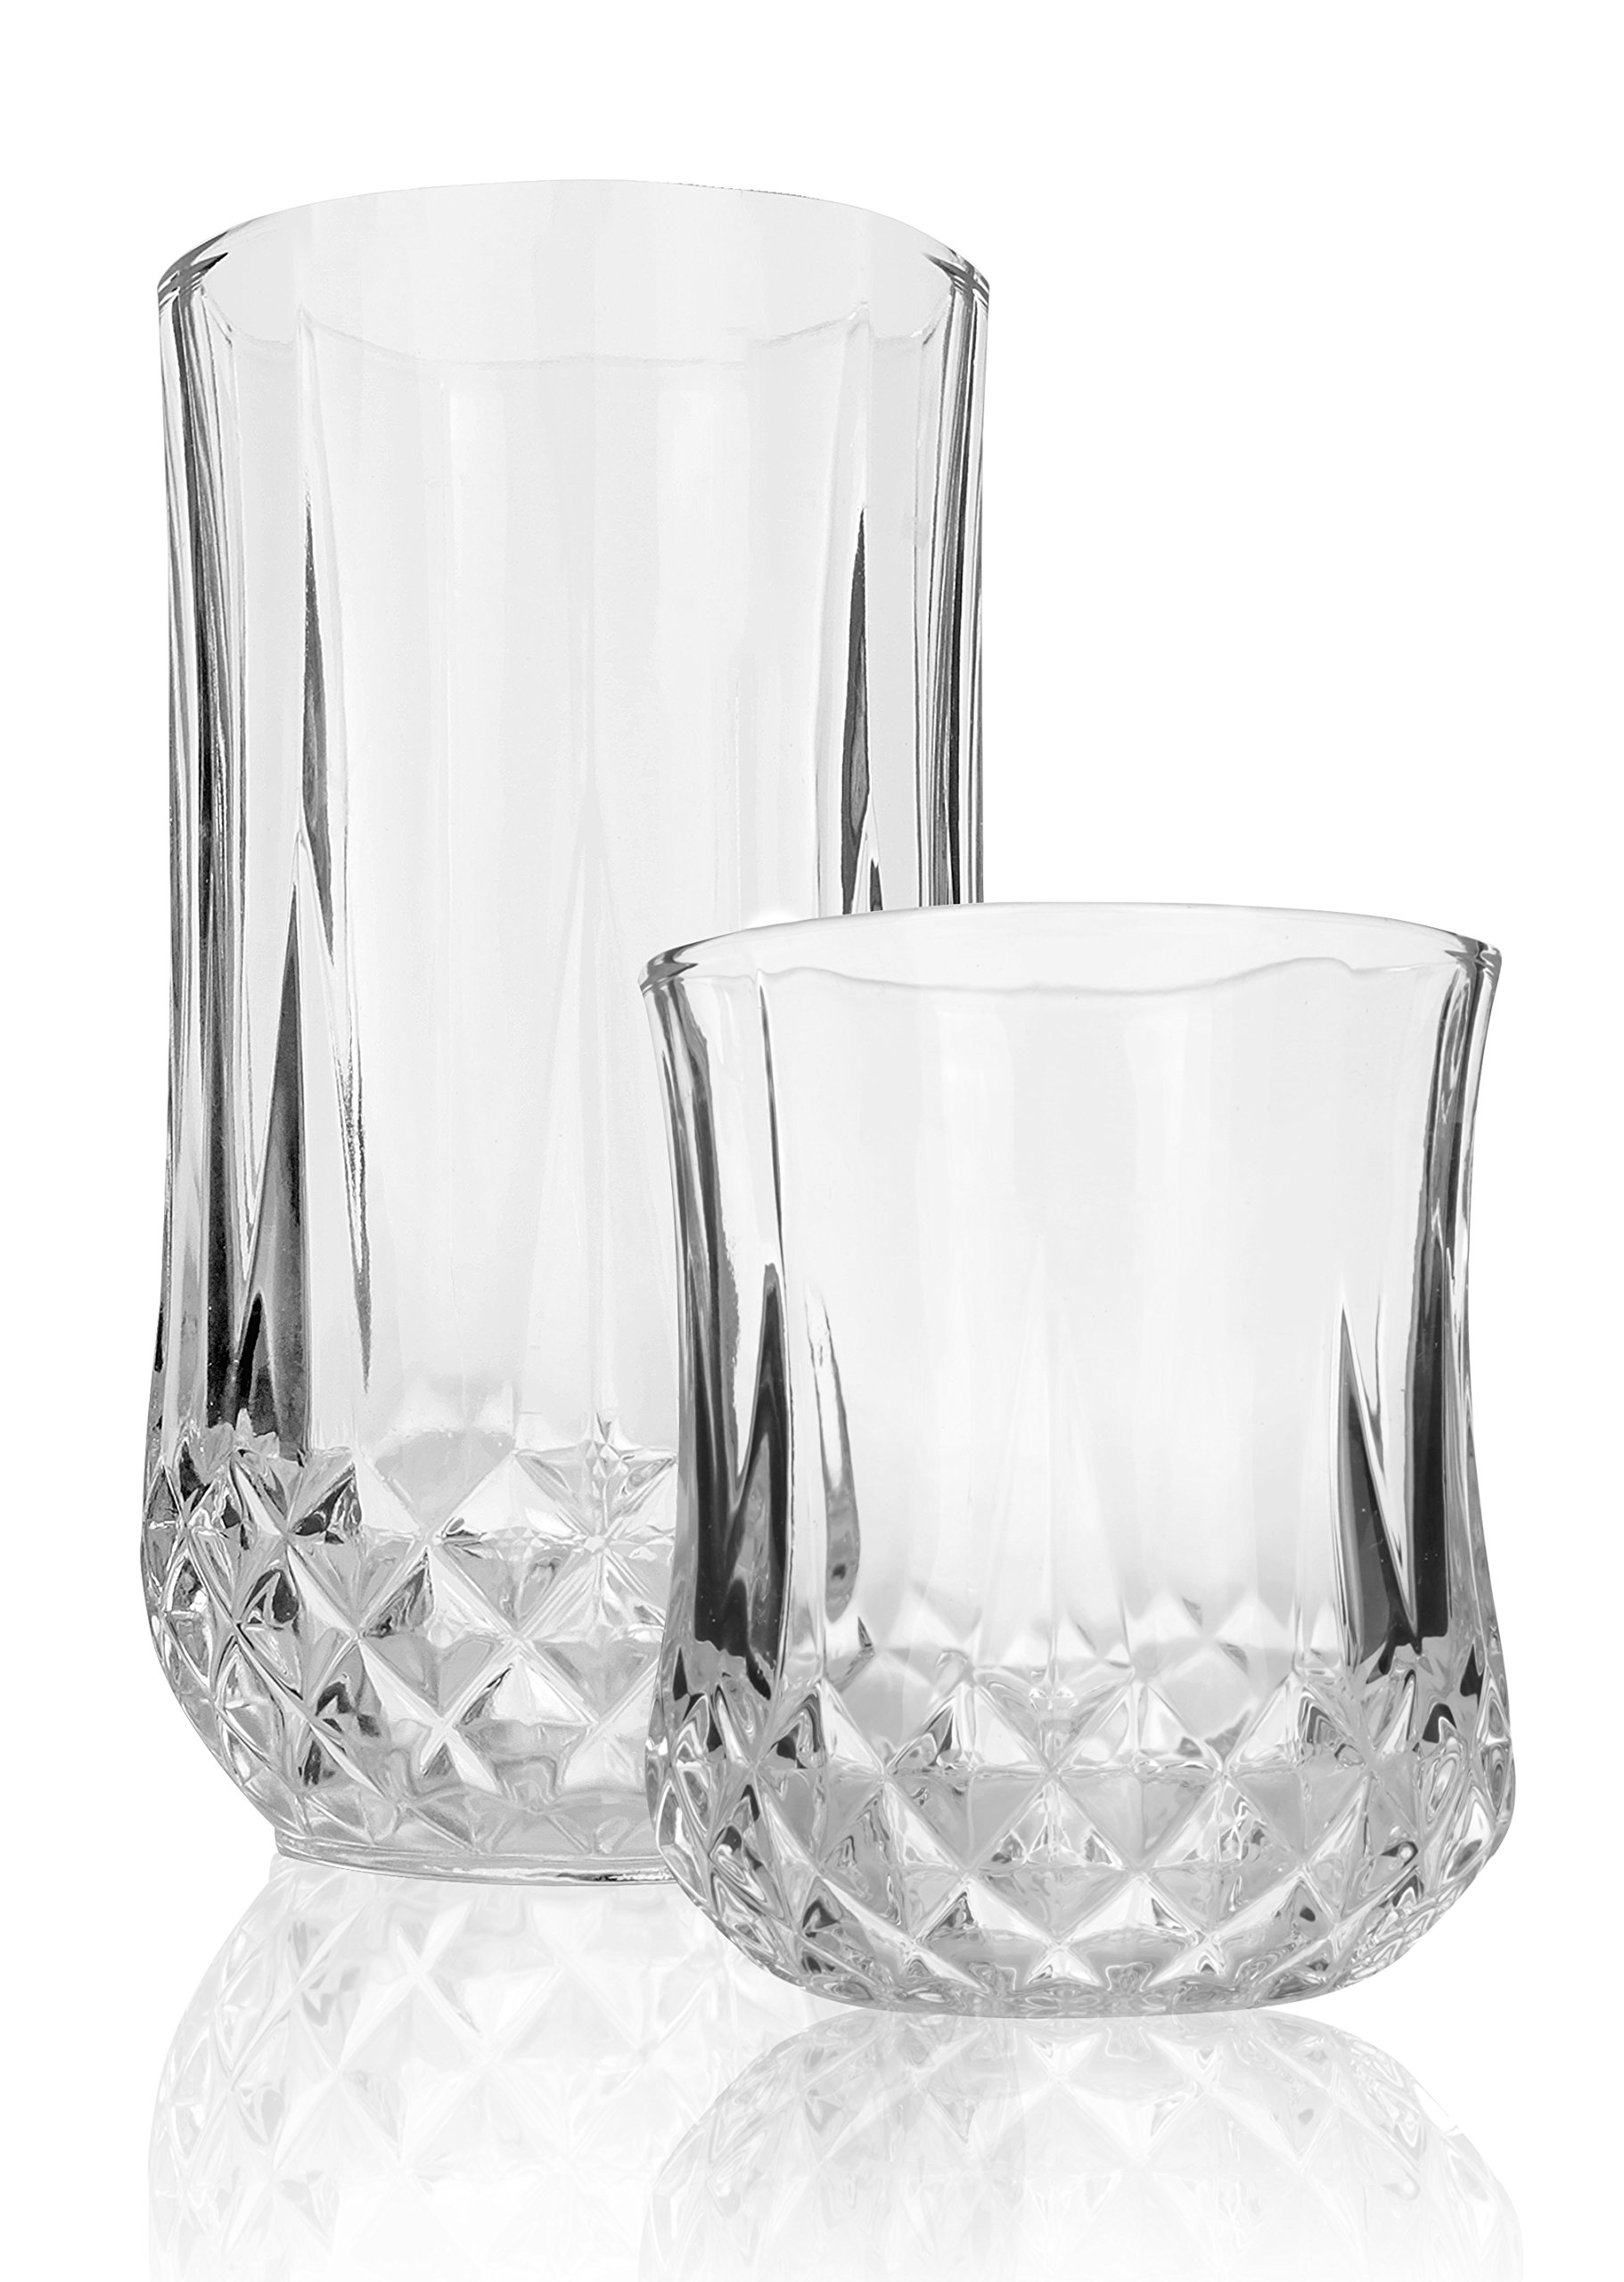 Palais Glassware 'Marseille' Mixed Drinkware, Elegant Diamond Cut Clear Glass set (Set of 12, 6 - 9 Oz. & 6 - 13 Oz.) by Palais Glassware (Image #1)